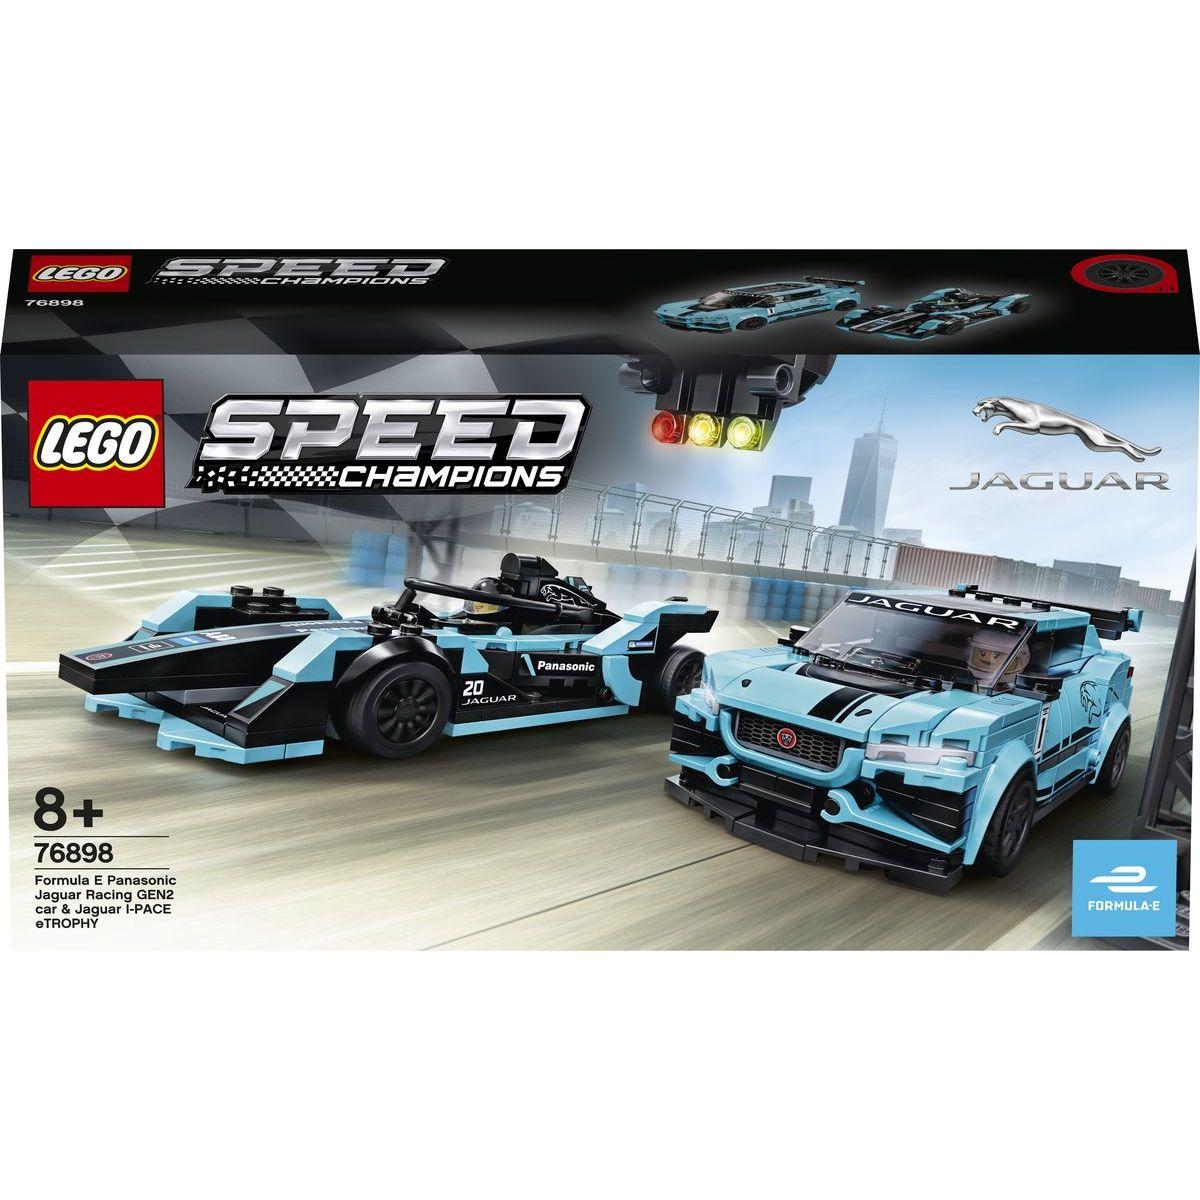 LEGO Speed Champions 76898 Formula E Panasonic Jaguar Racing GEN2